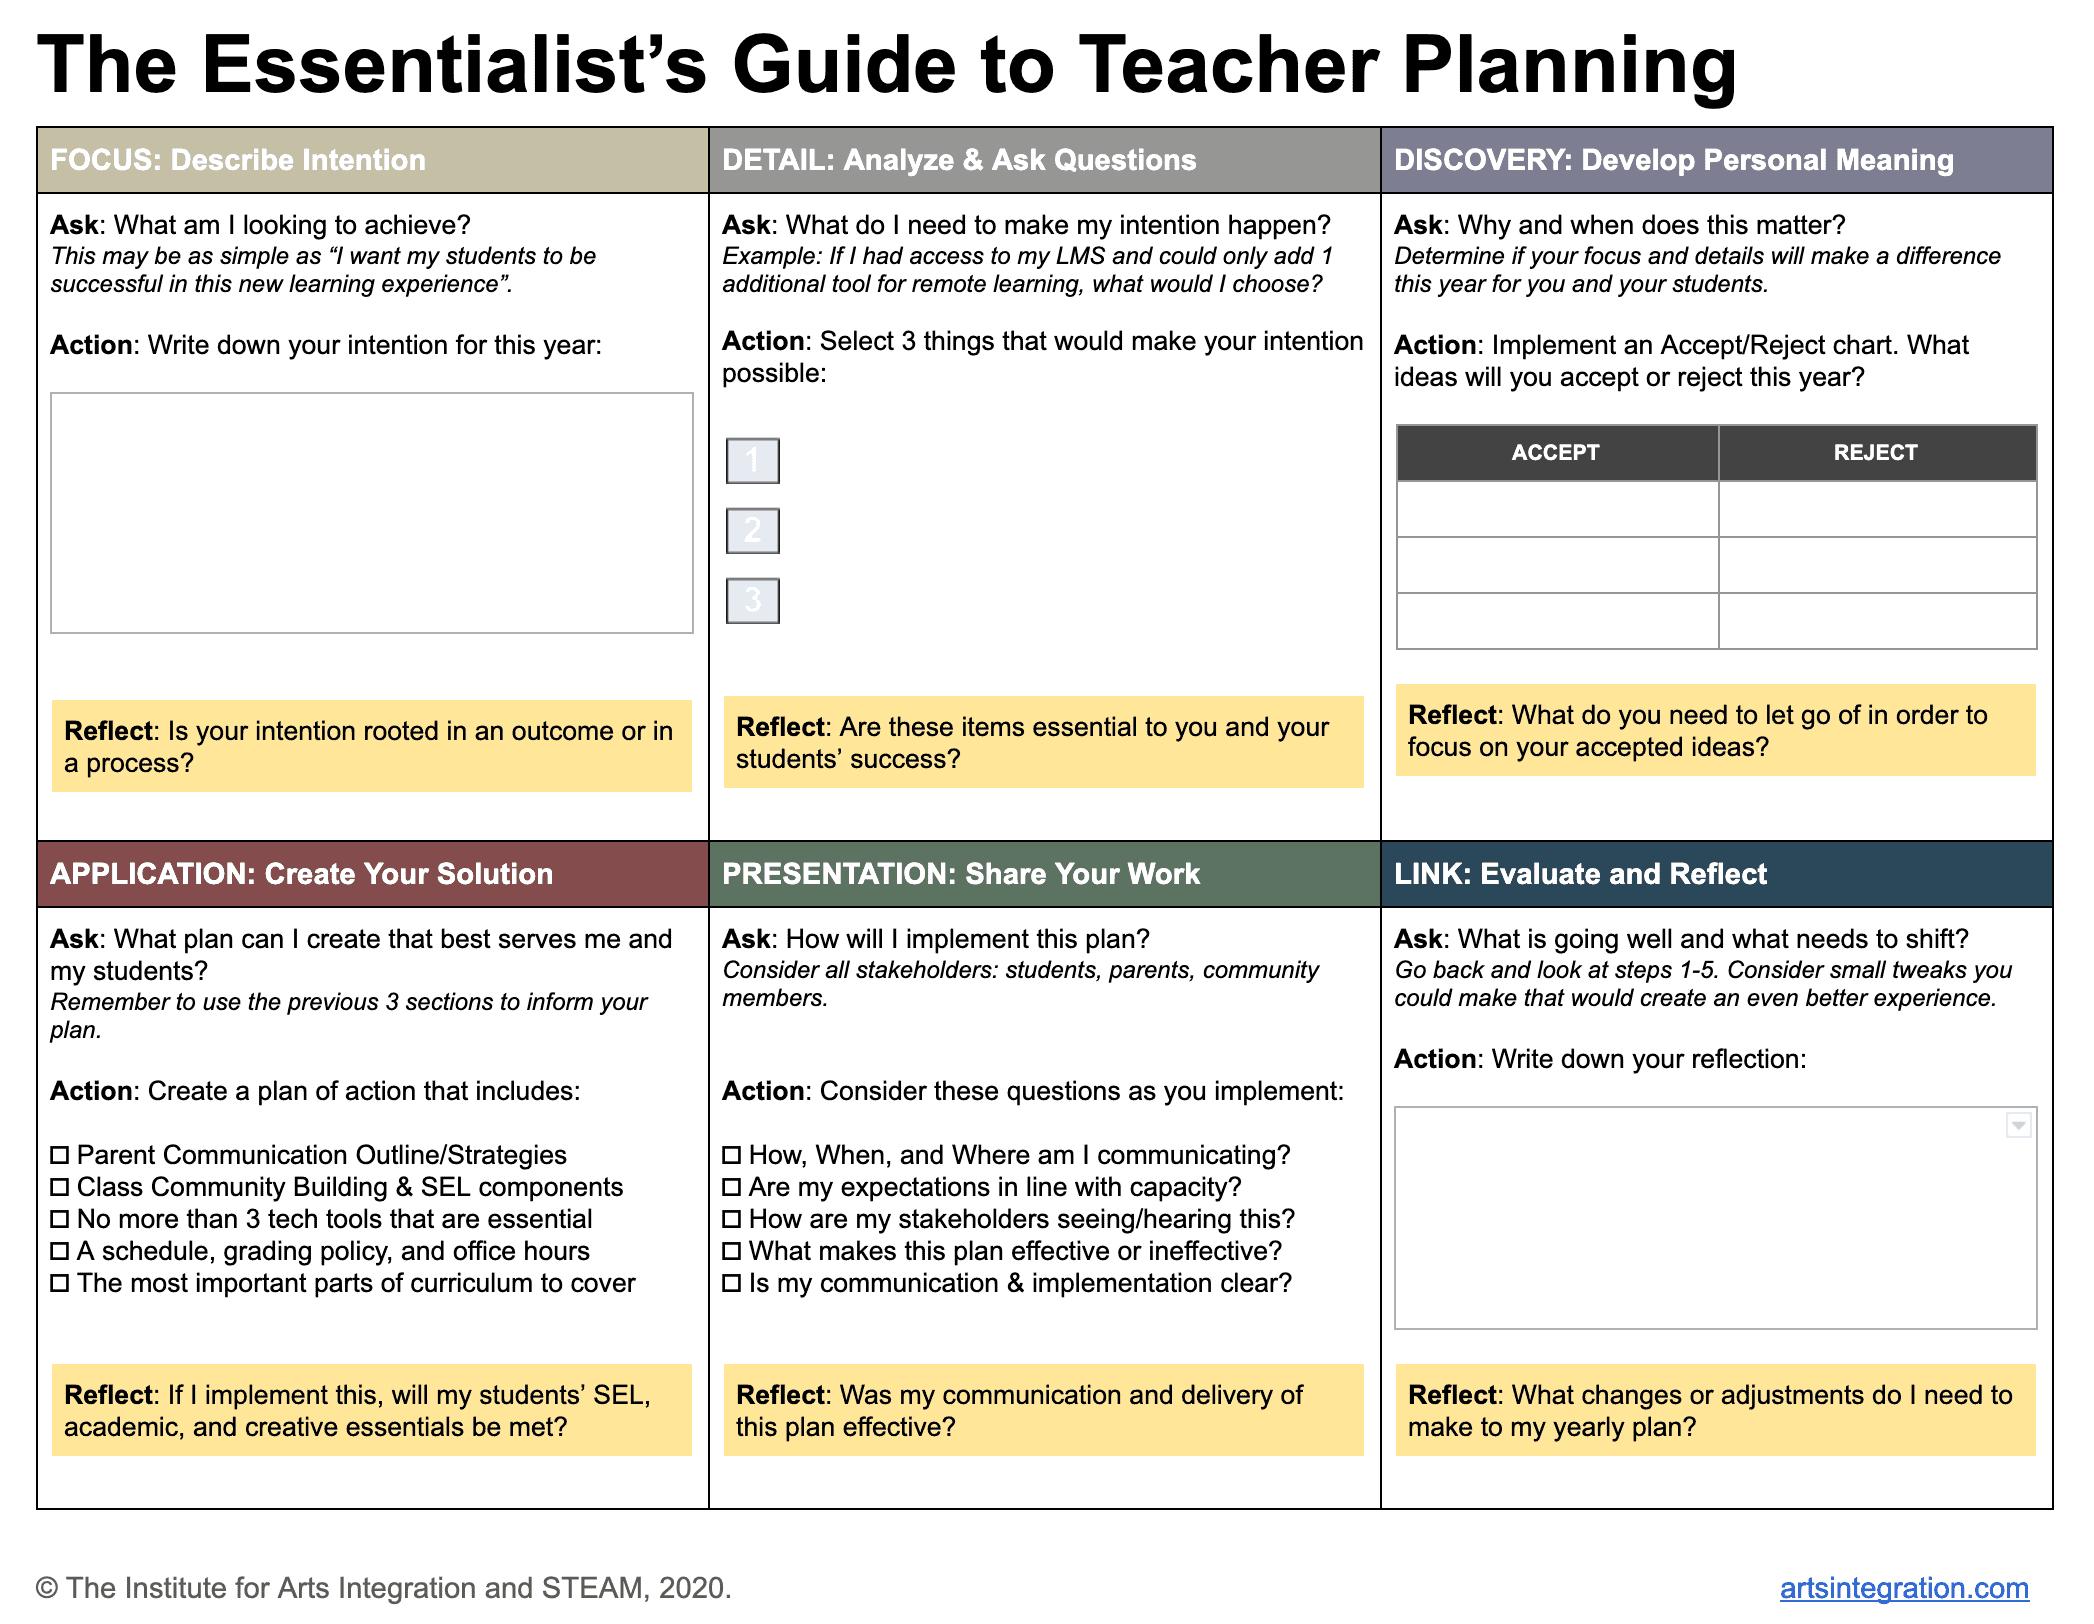 The Essentialist's Guide to Teacher Planning Framework